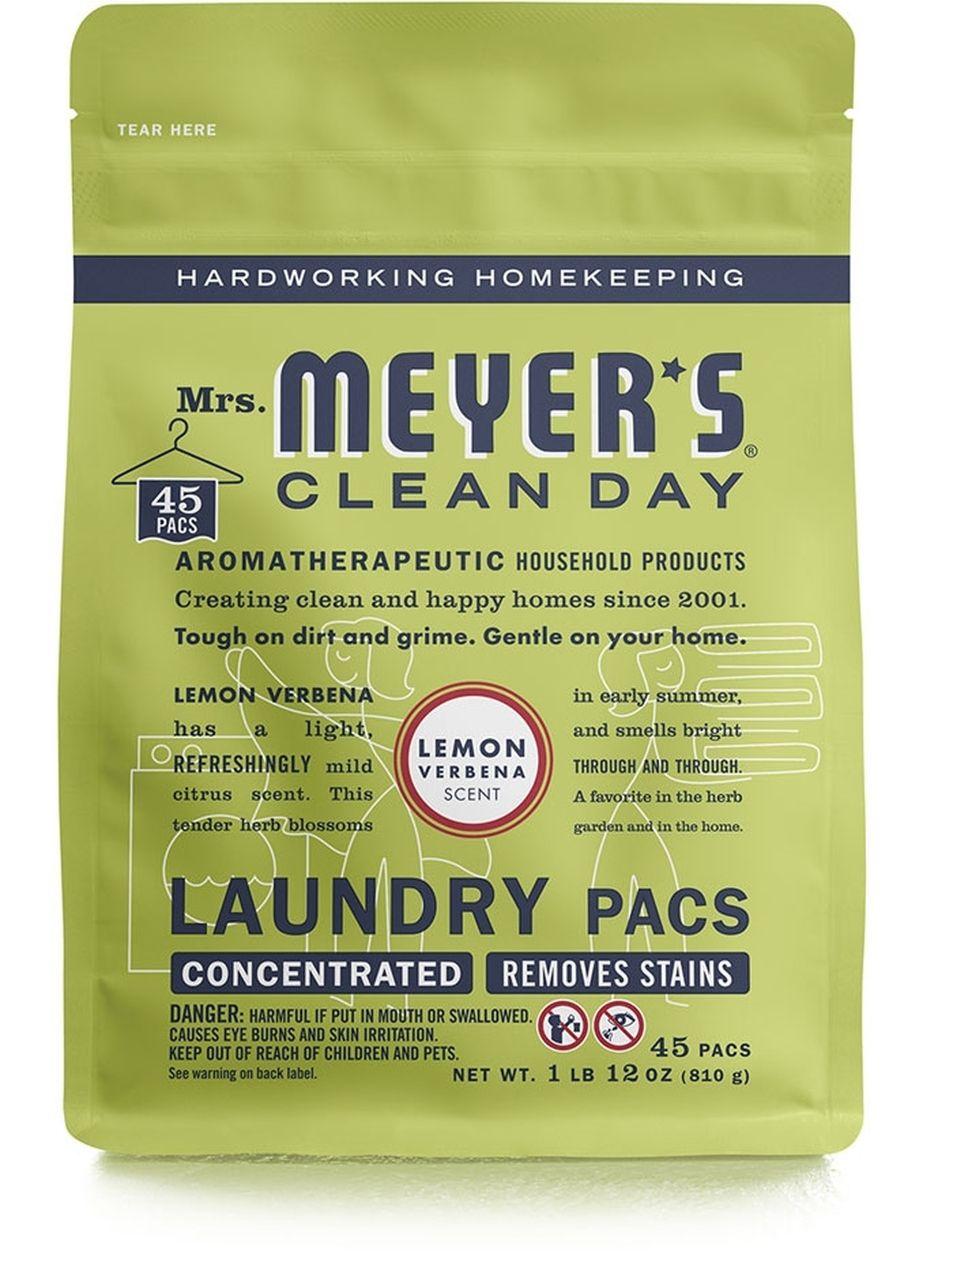 Mrs Meyer S Lemon Verbena Laundry Packs 45ct Lemon Verbena